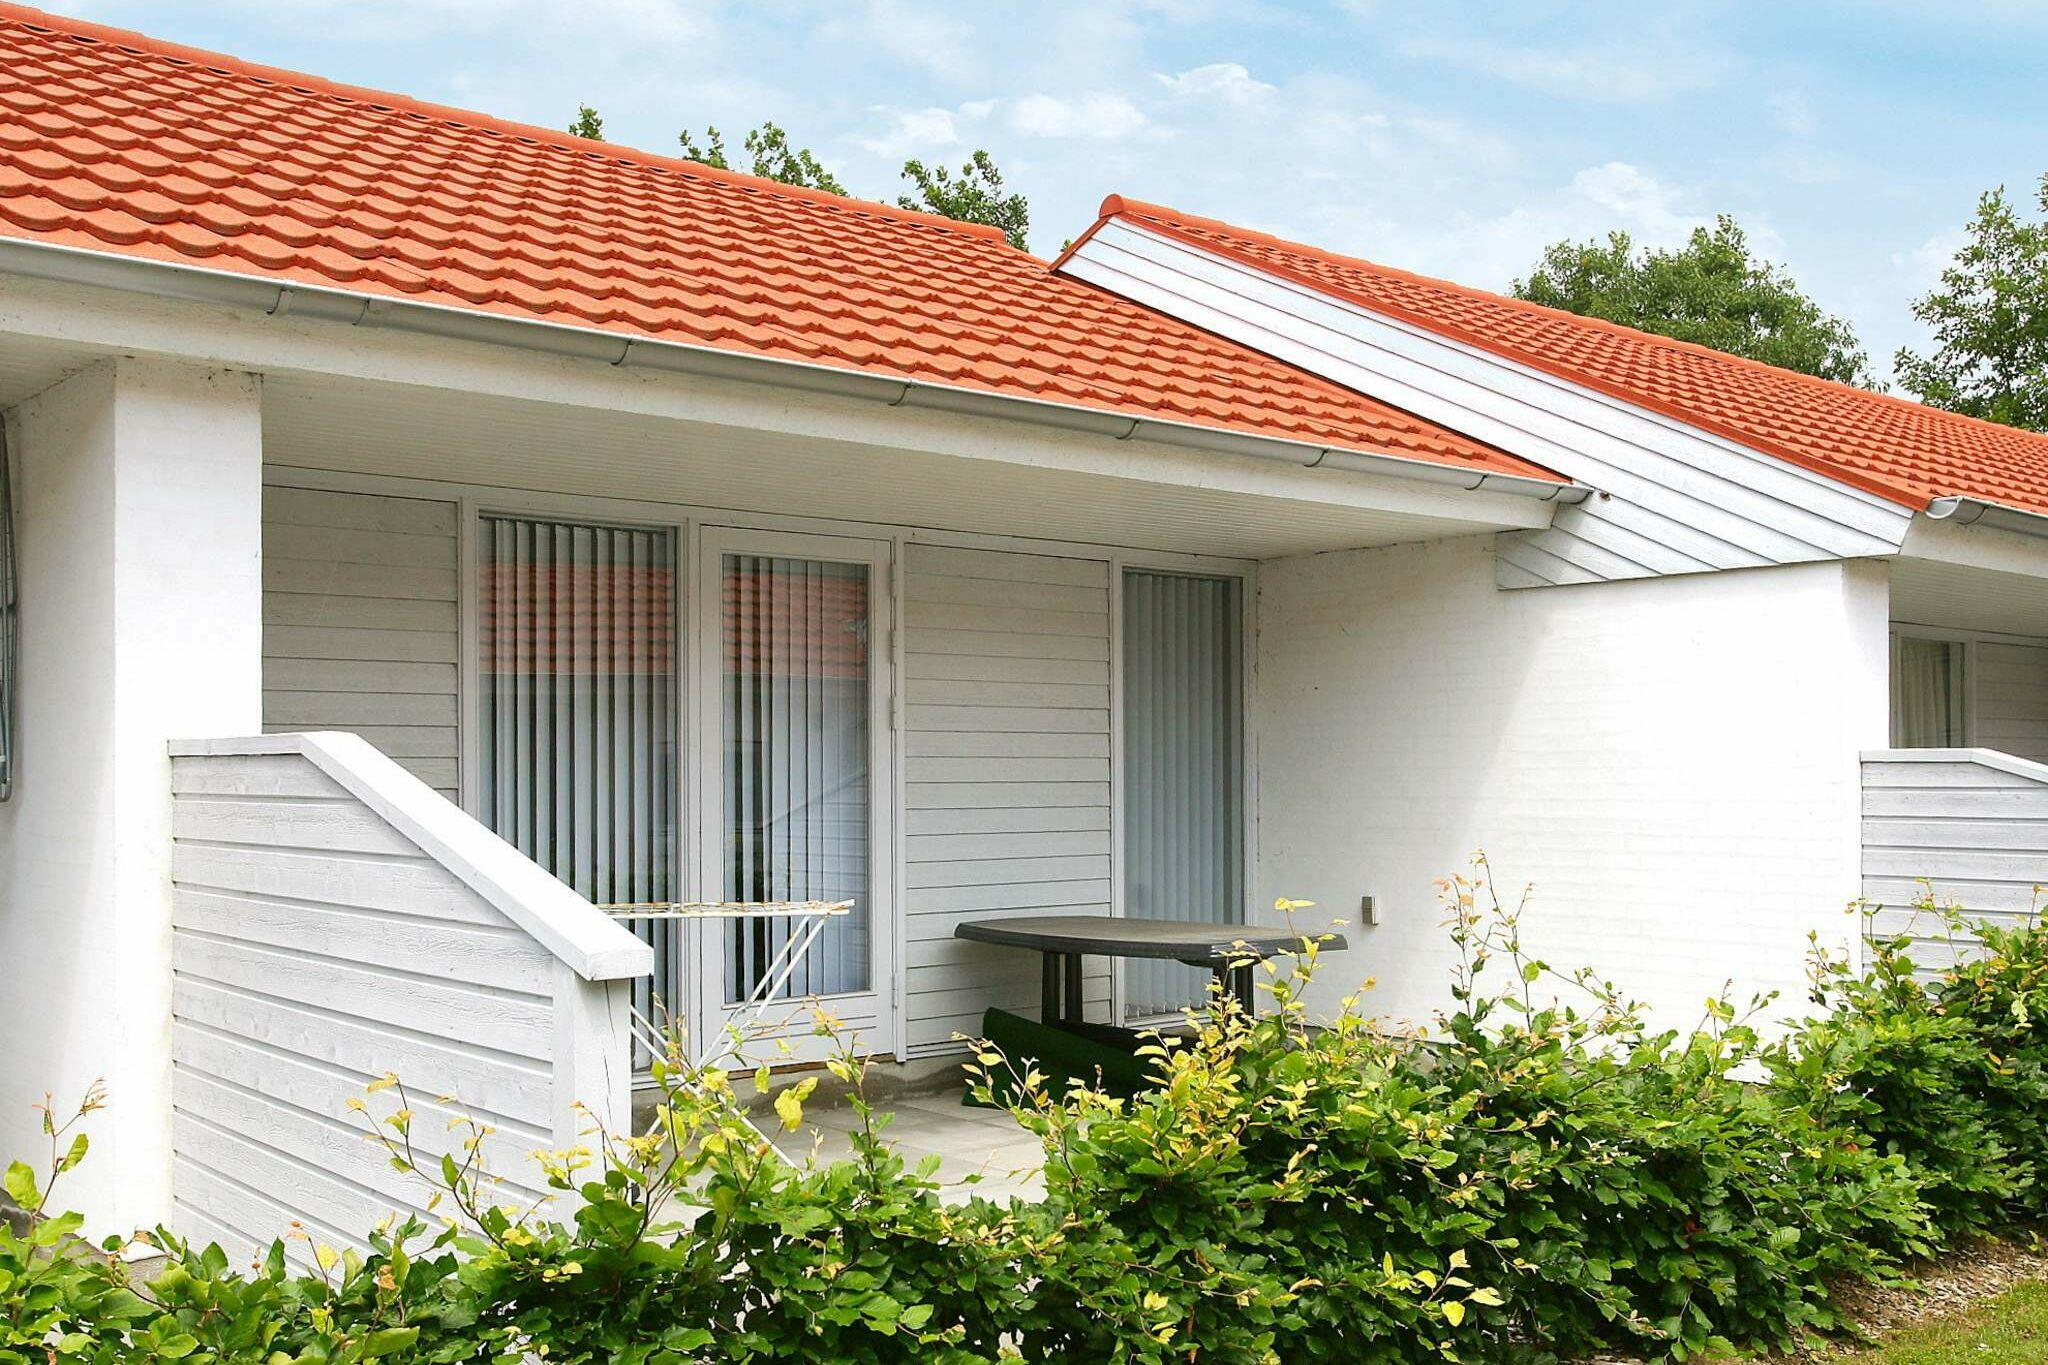 Ferienhaus in Ärösköbing für 4 Personen